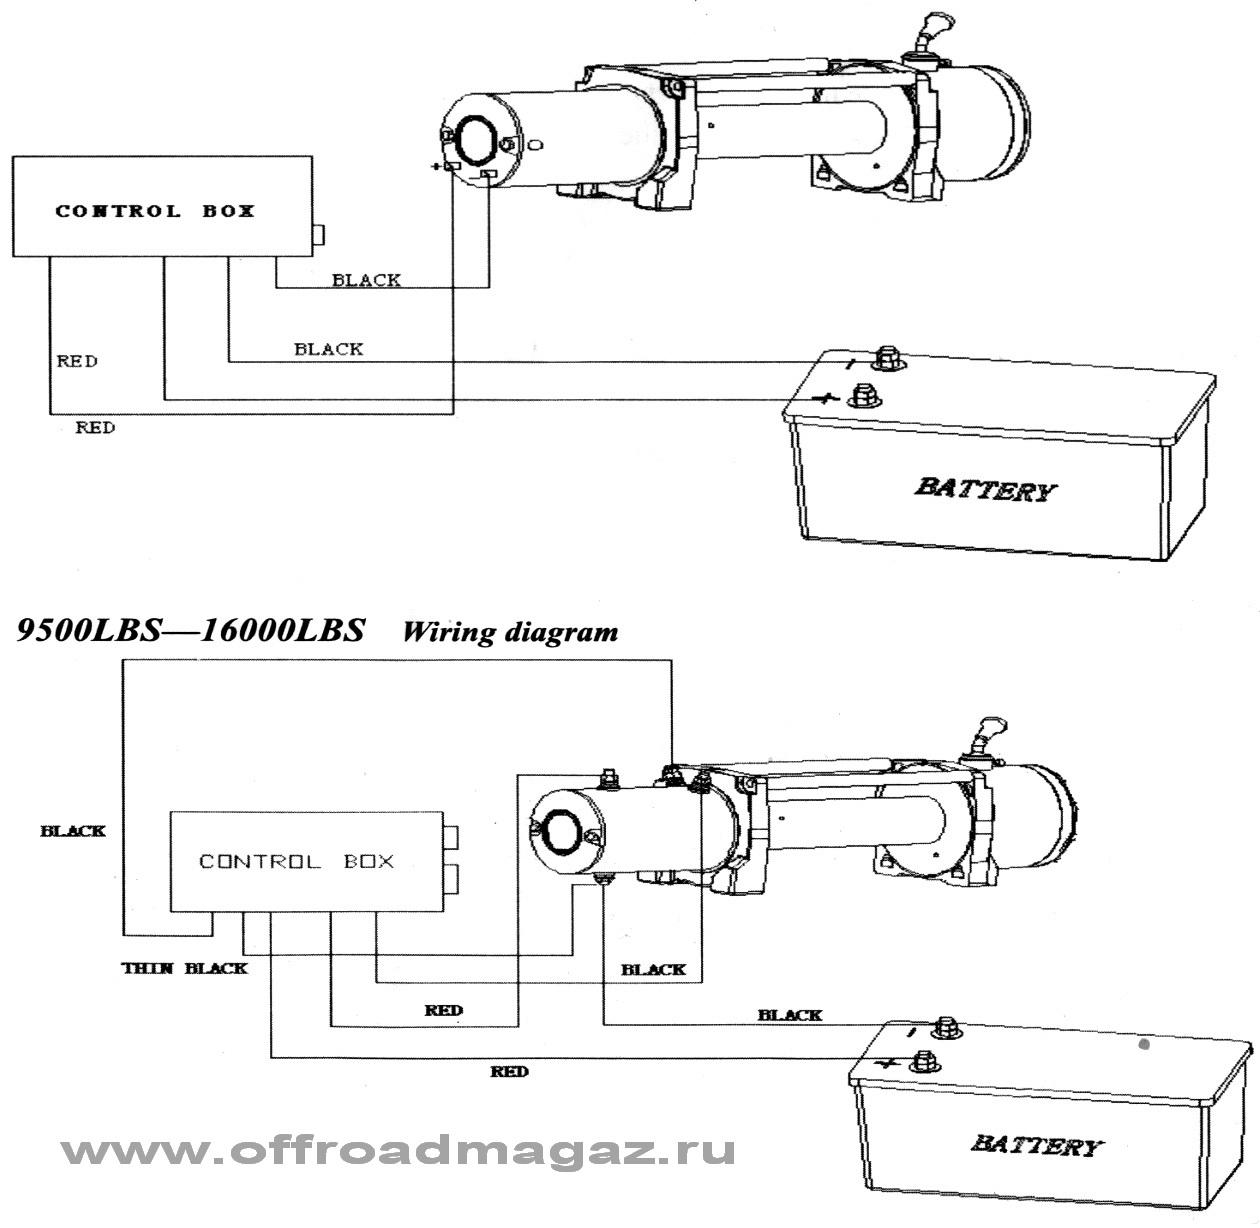 T Max Winch Wiring Diagram -22 Hp Kohler Wiring Diagram   Begeboy Wiring  Diagram SourceBegeboy Wiring Diagram Source